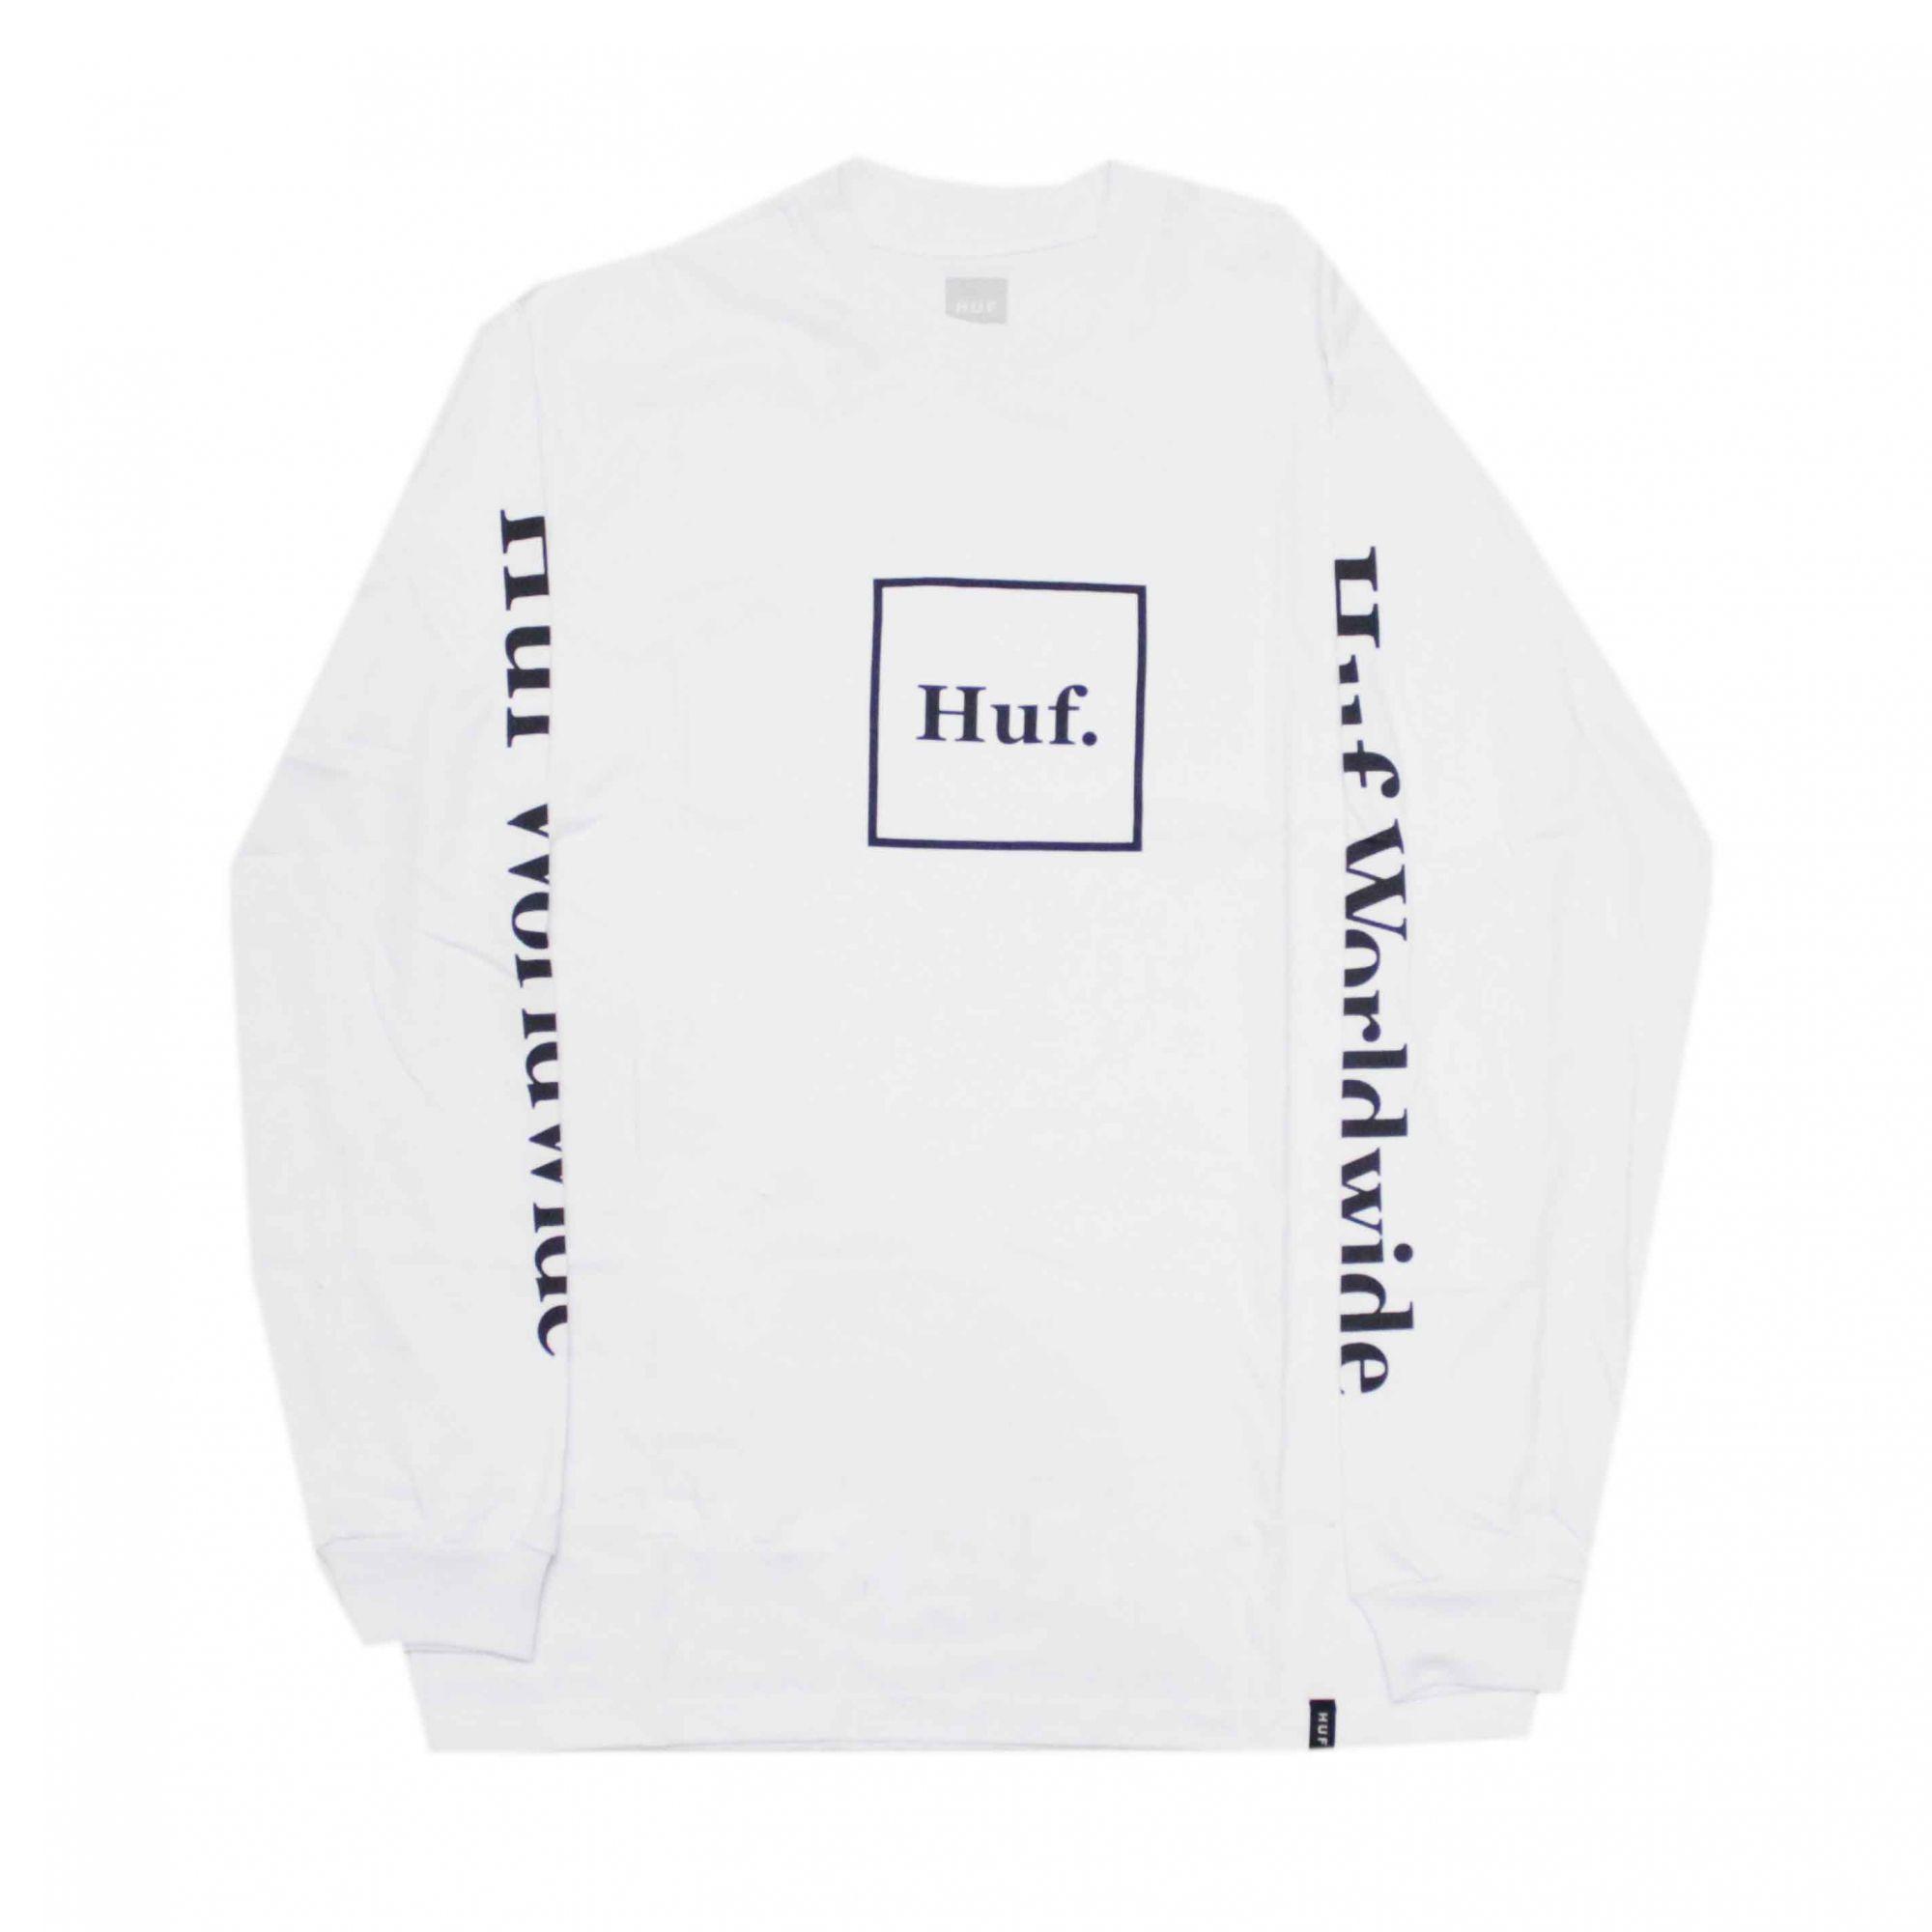 Camiseta Manga Longa HUF Essentials Domestic Box Branco